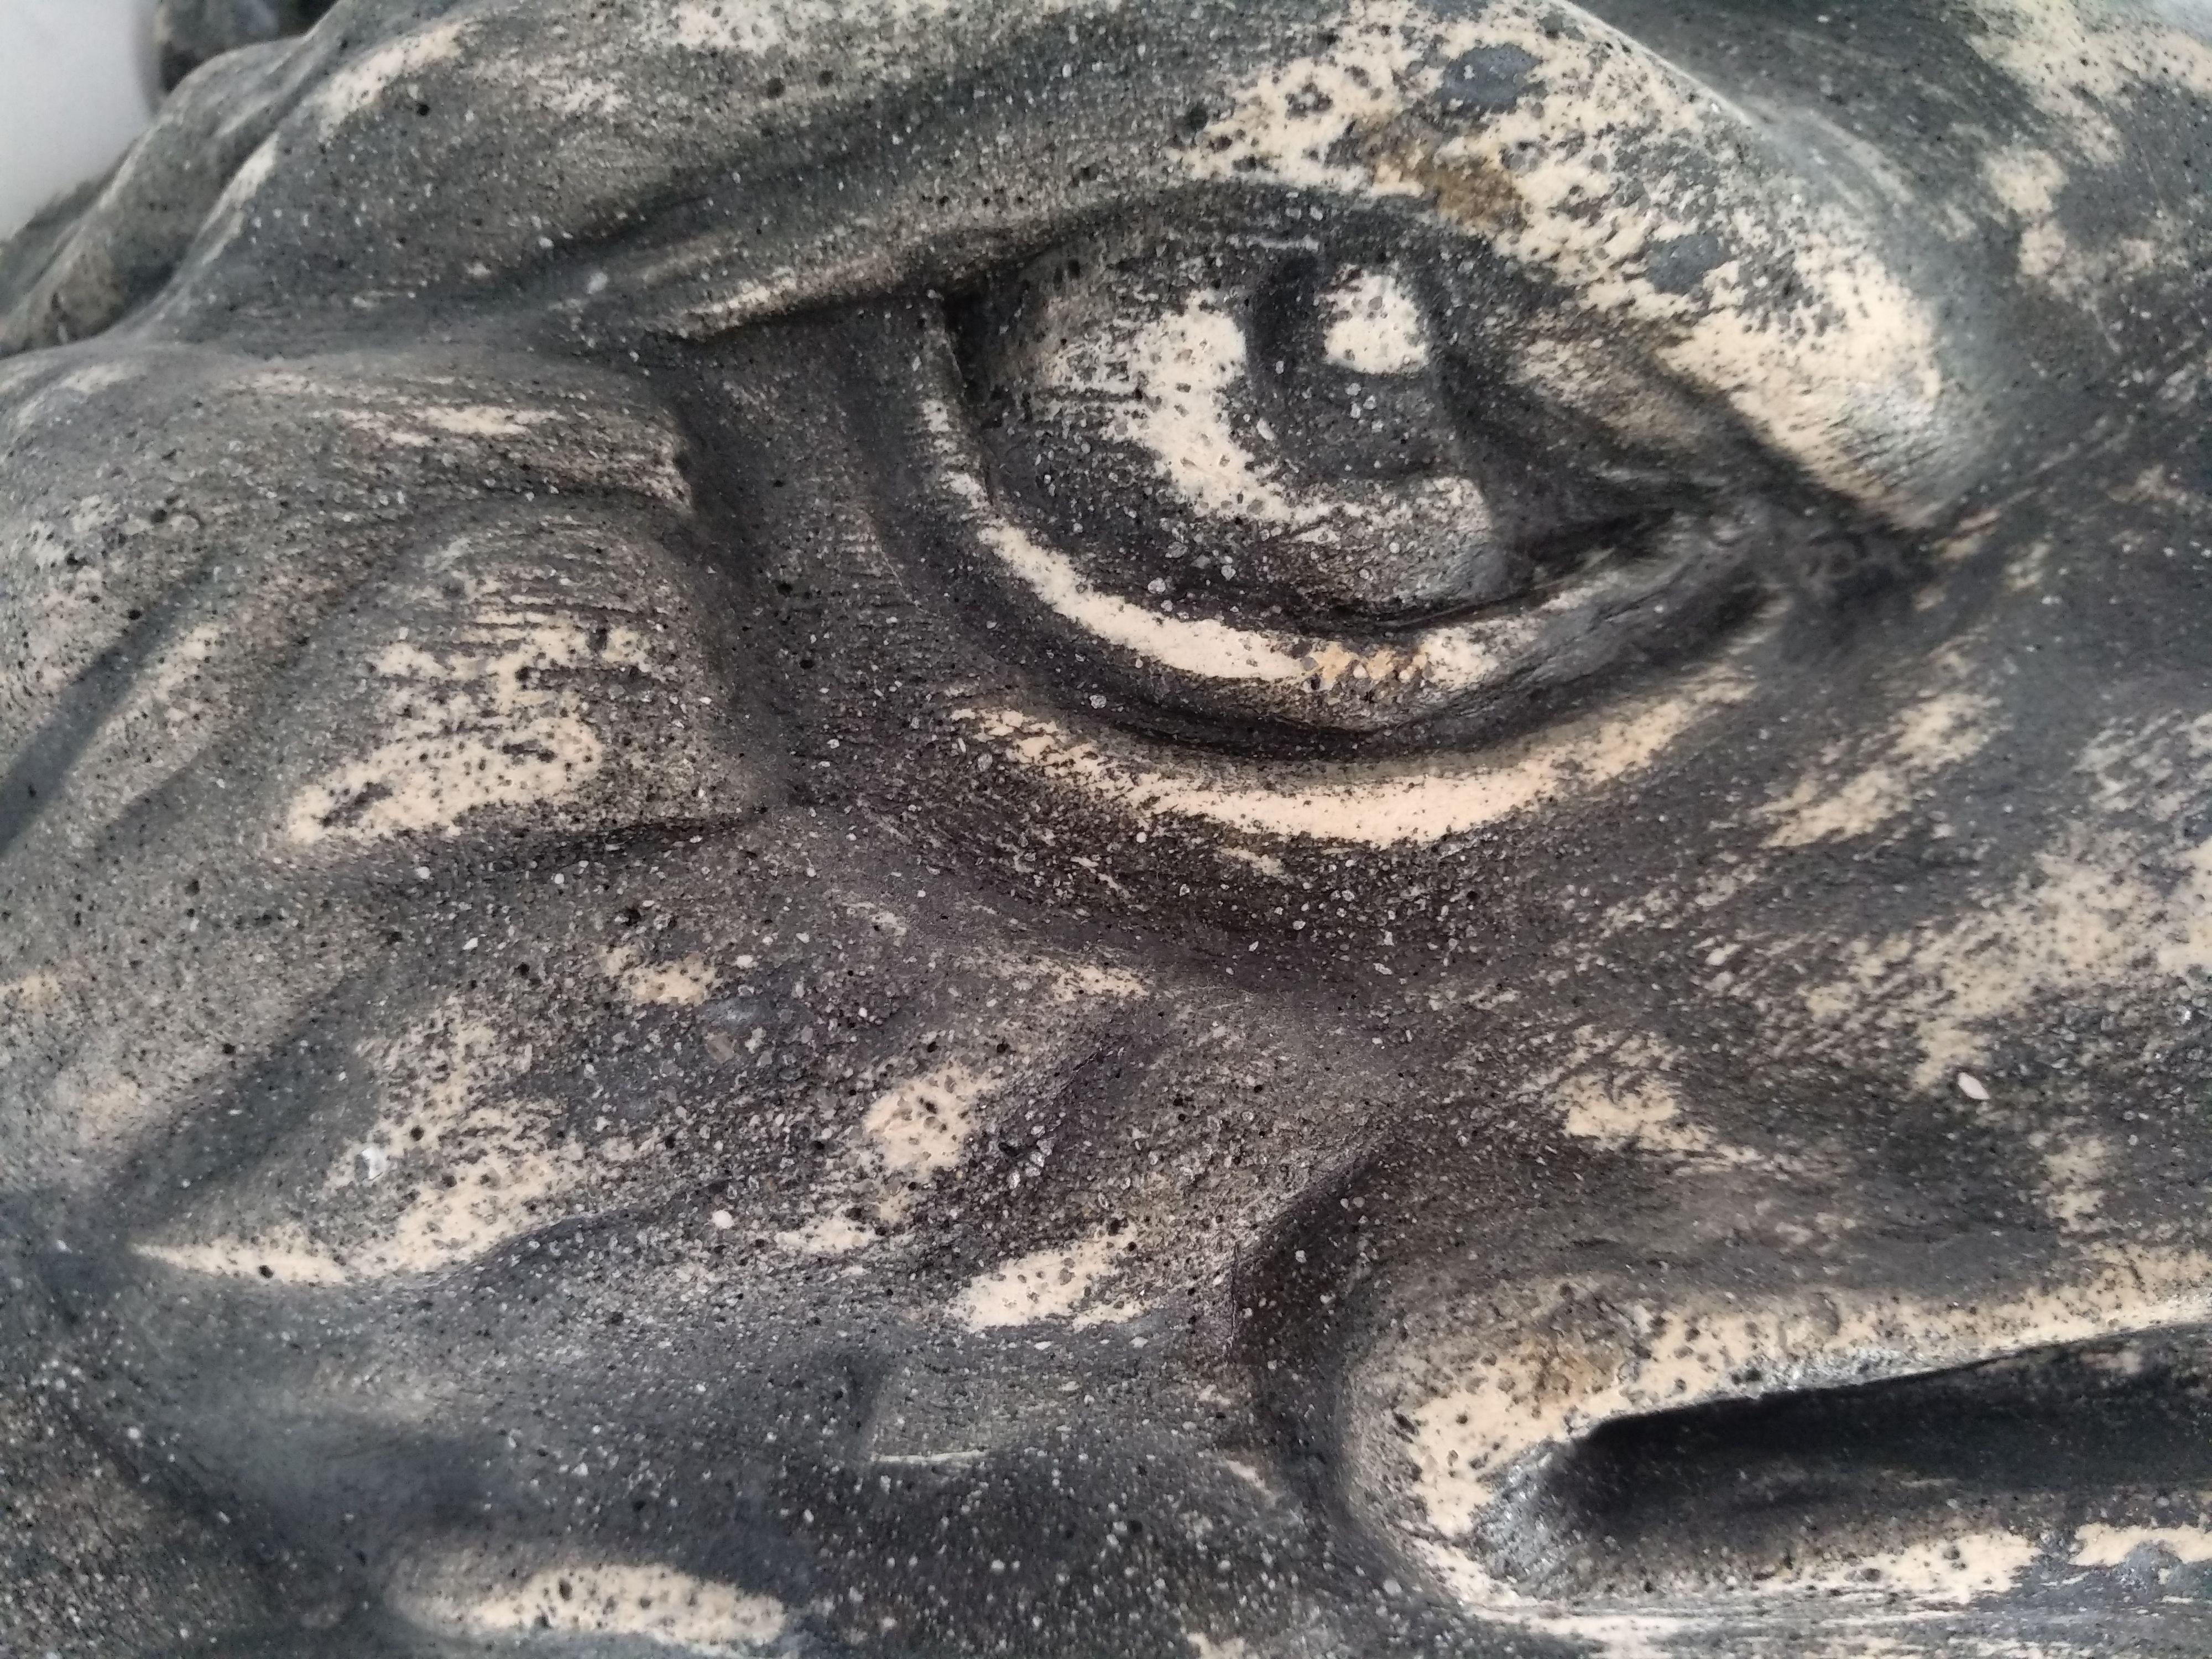 птица голова орел декор скульптура интерьер подарок